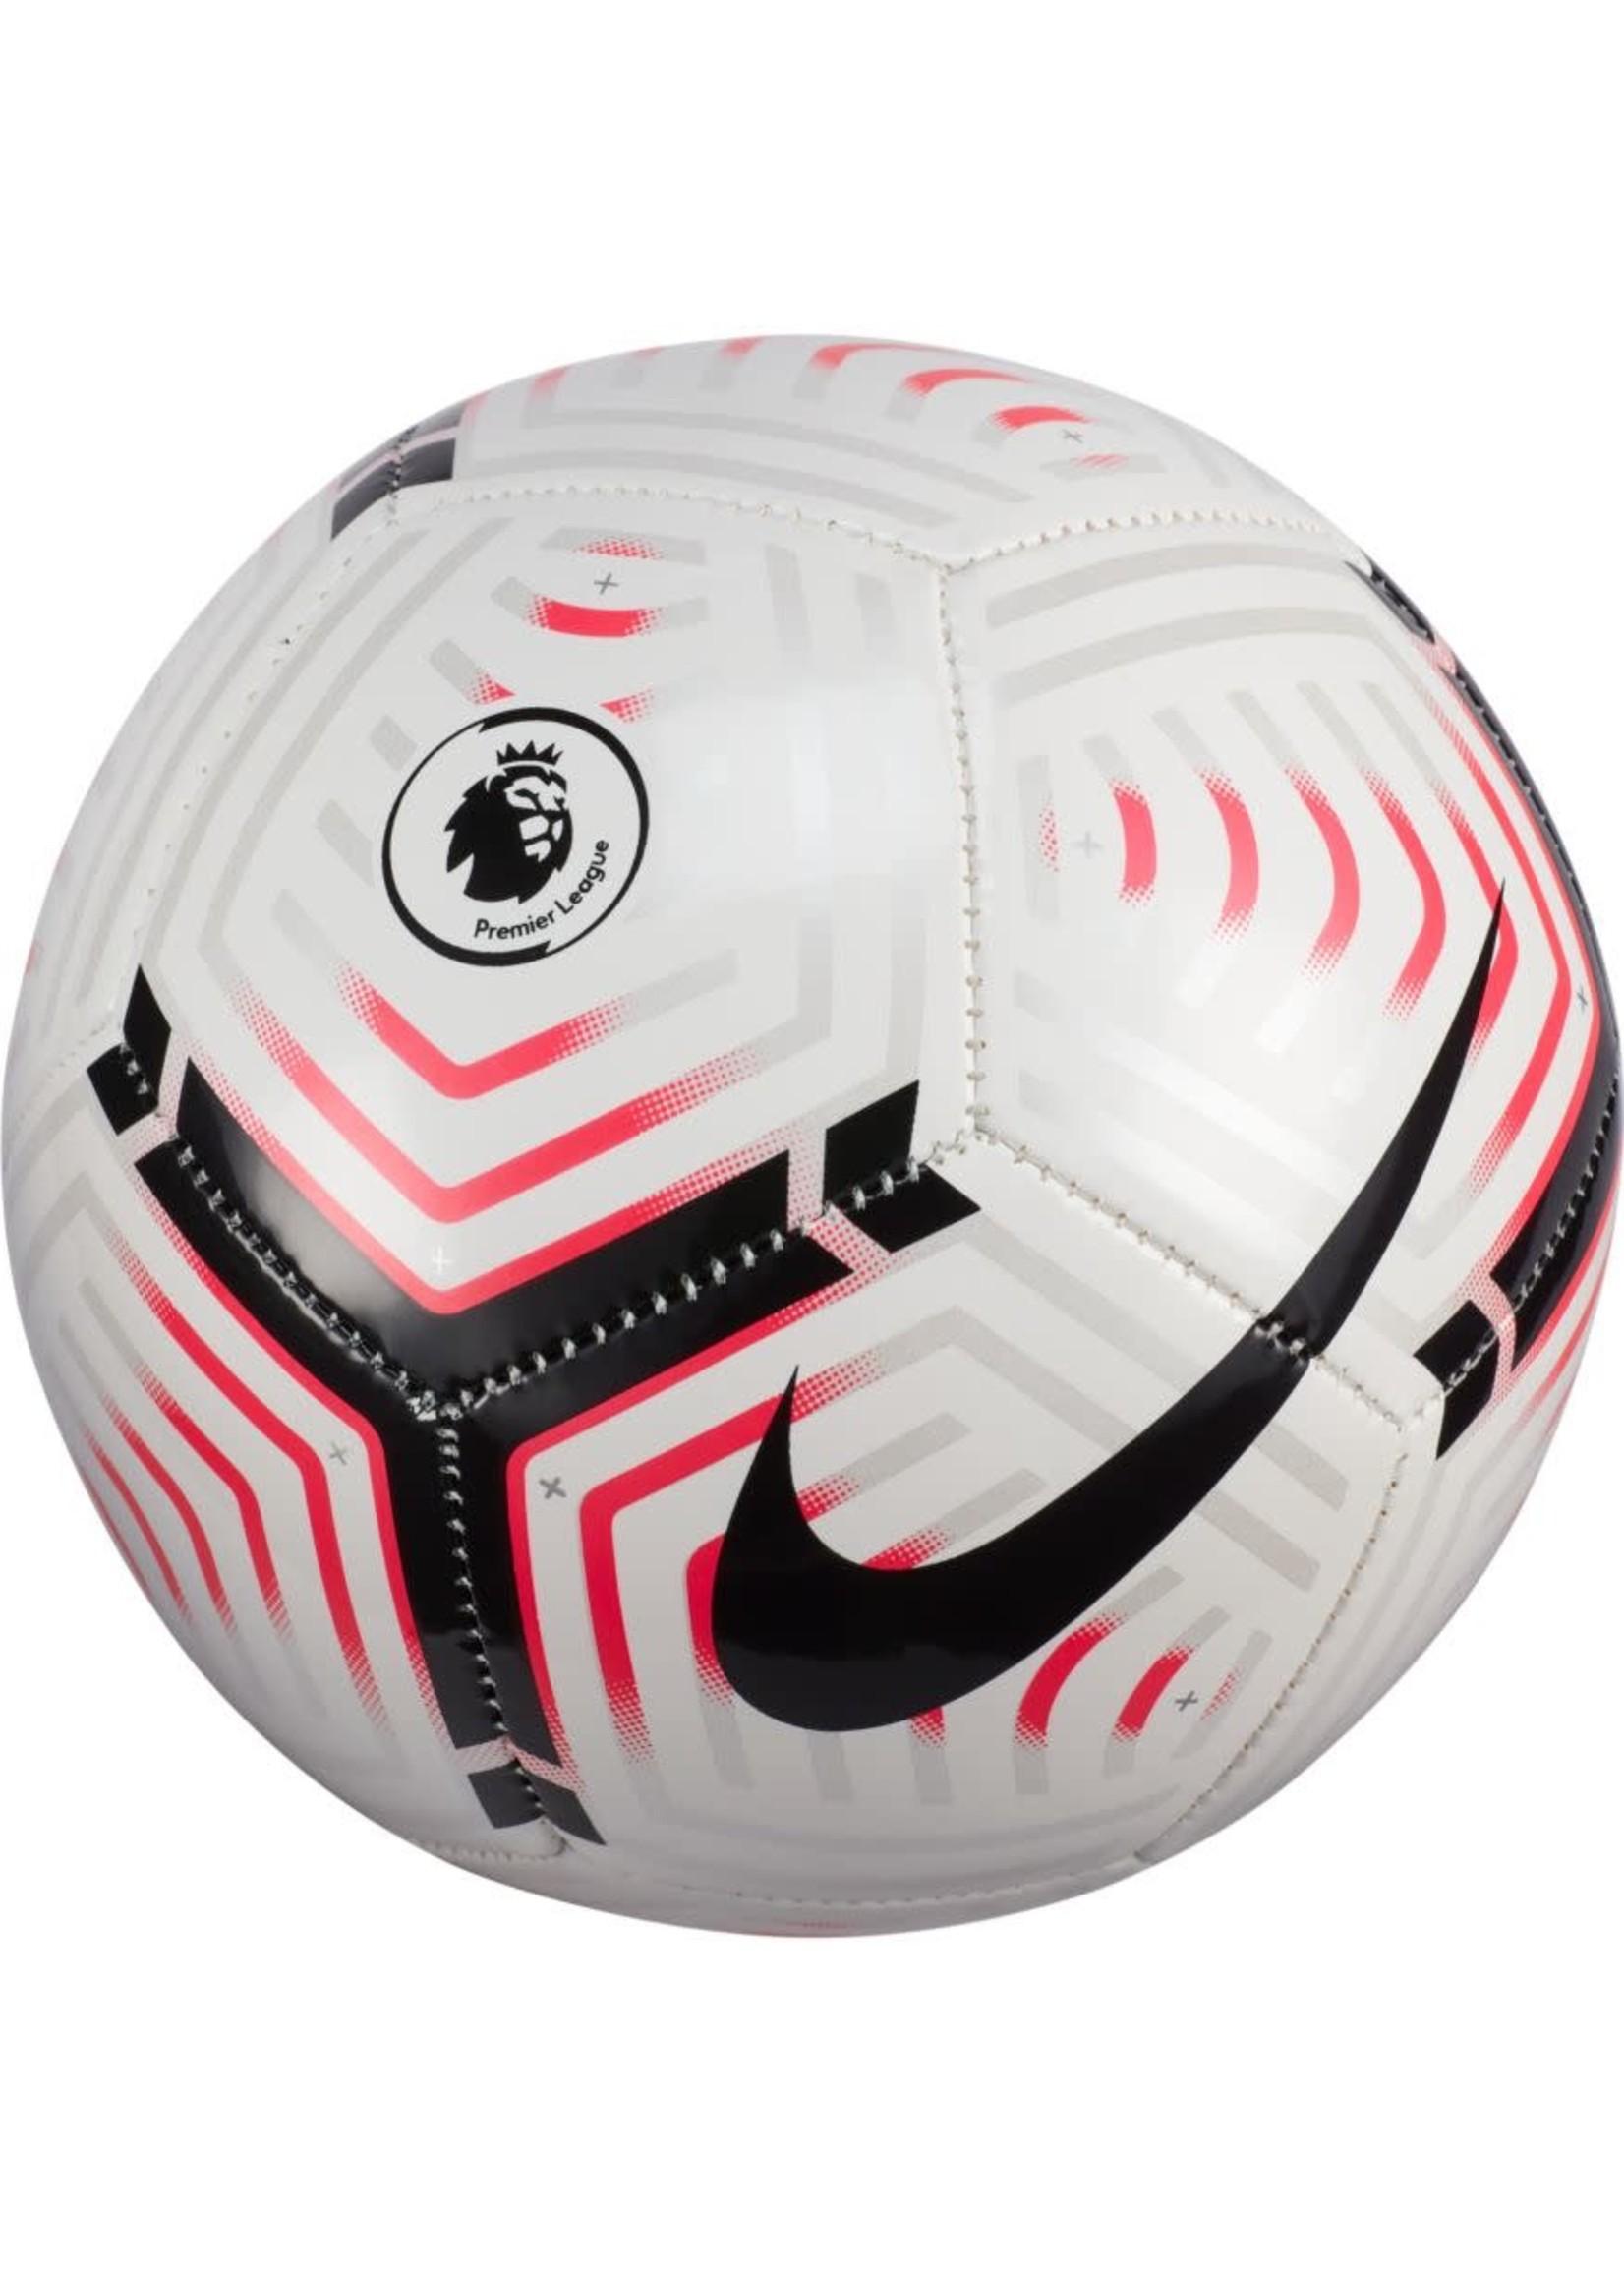 Nike Premier League 20/21 Mini